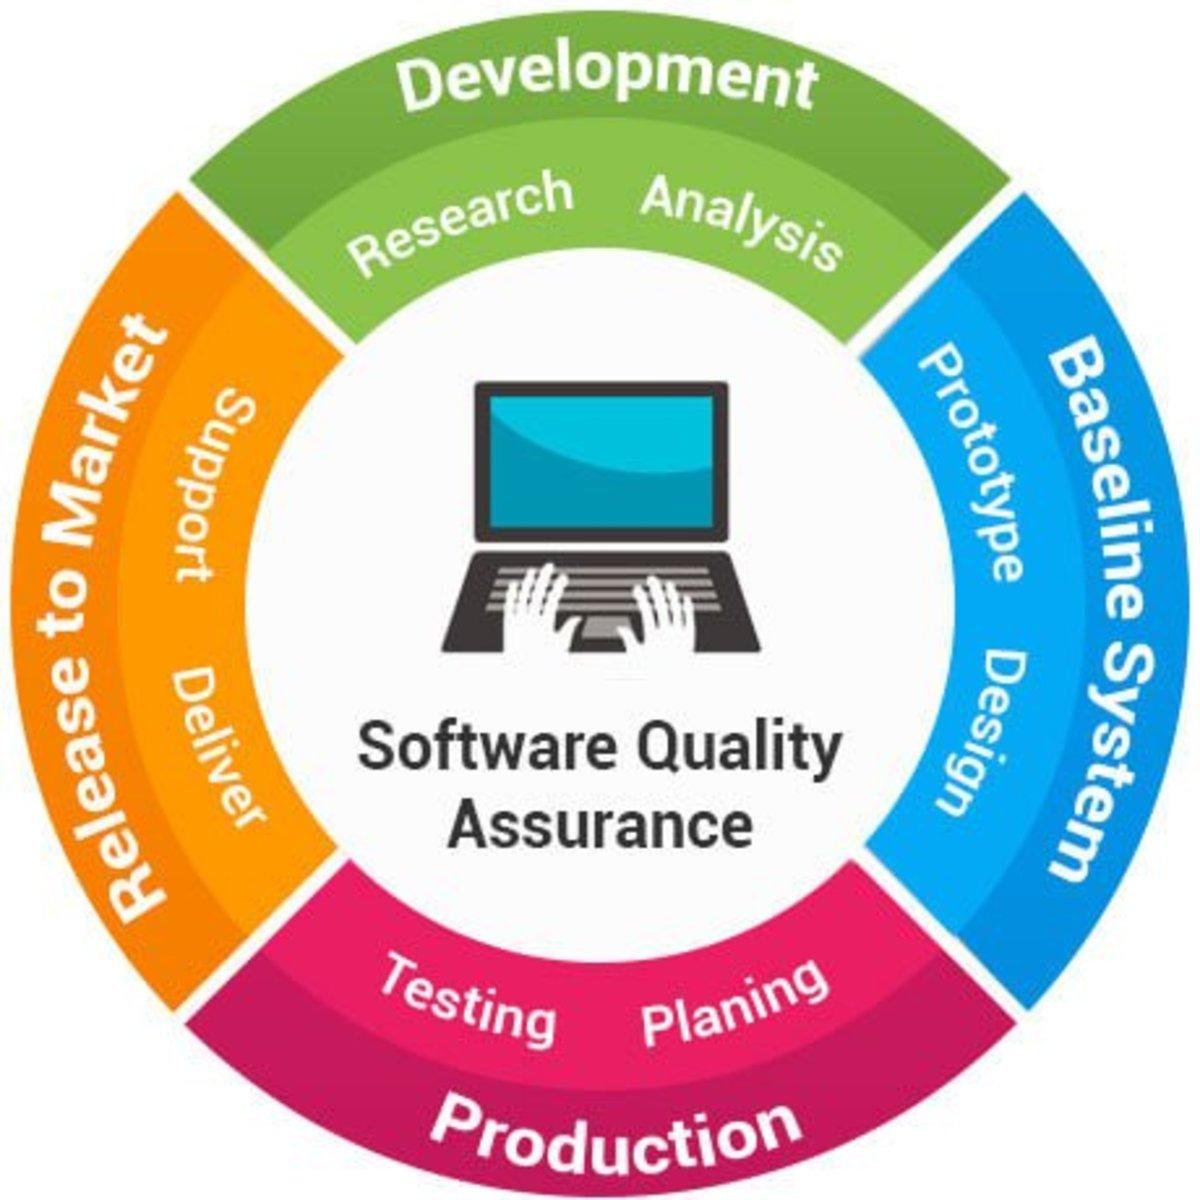 Steps for Quality Assurance